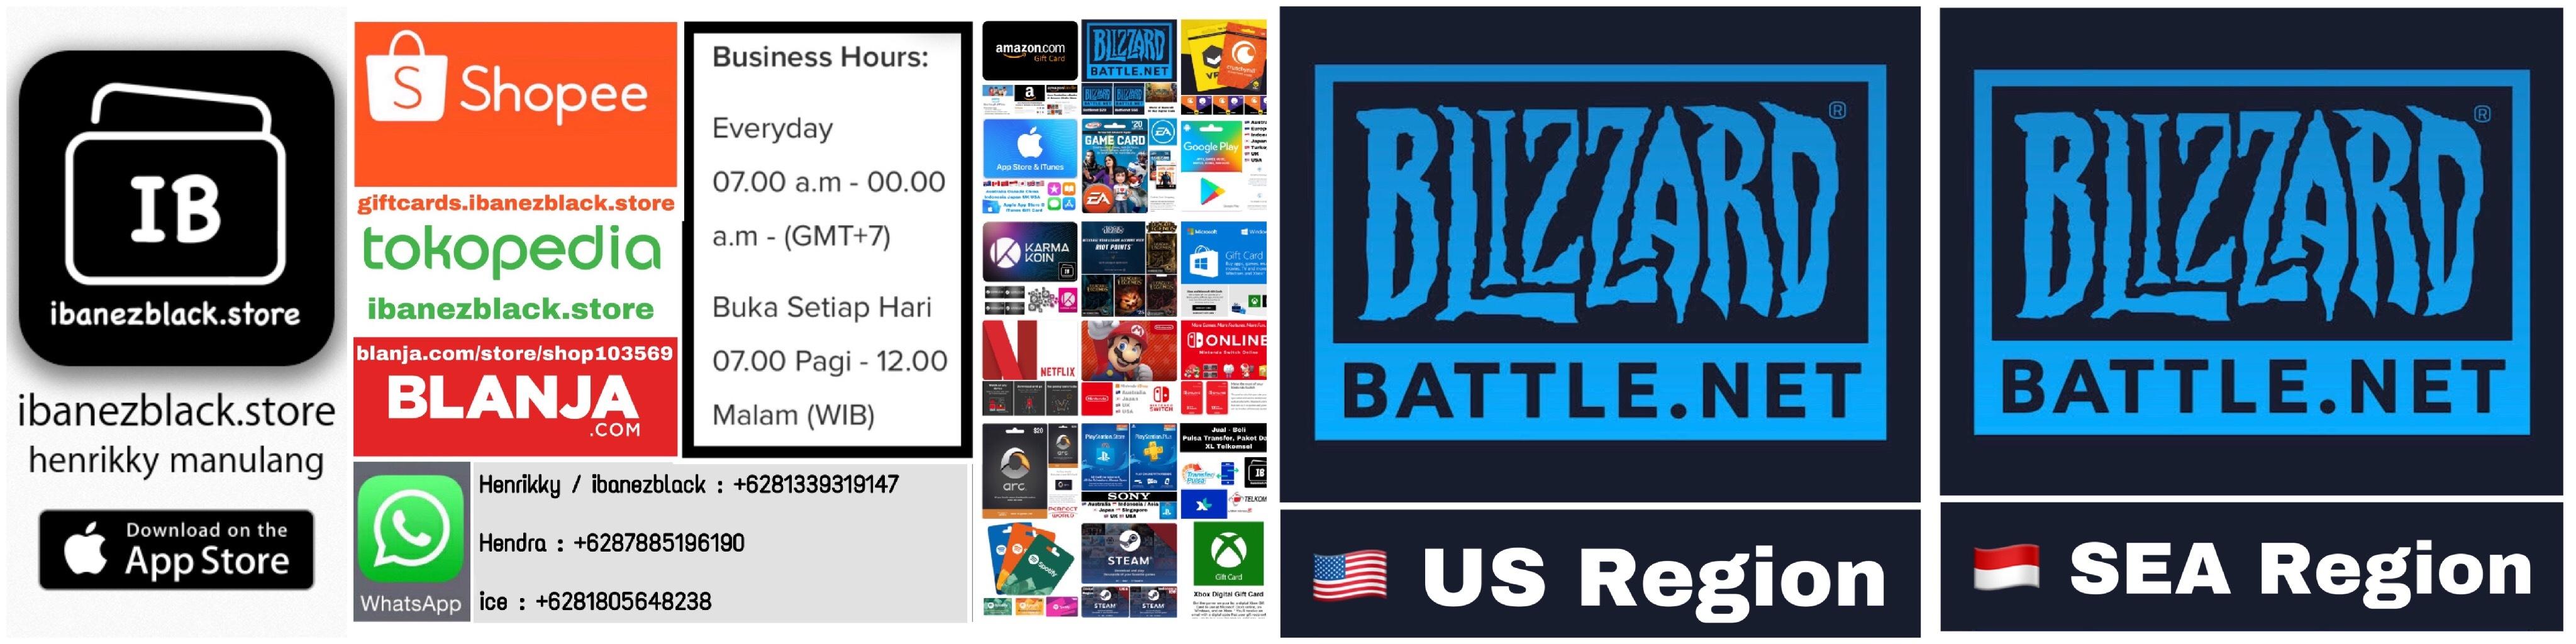 Blizzard Entertainment, Battle.net Store Gift Card, World of Warcraft